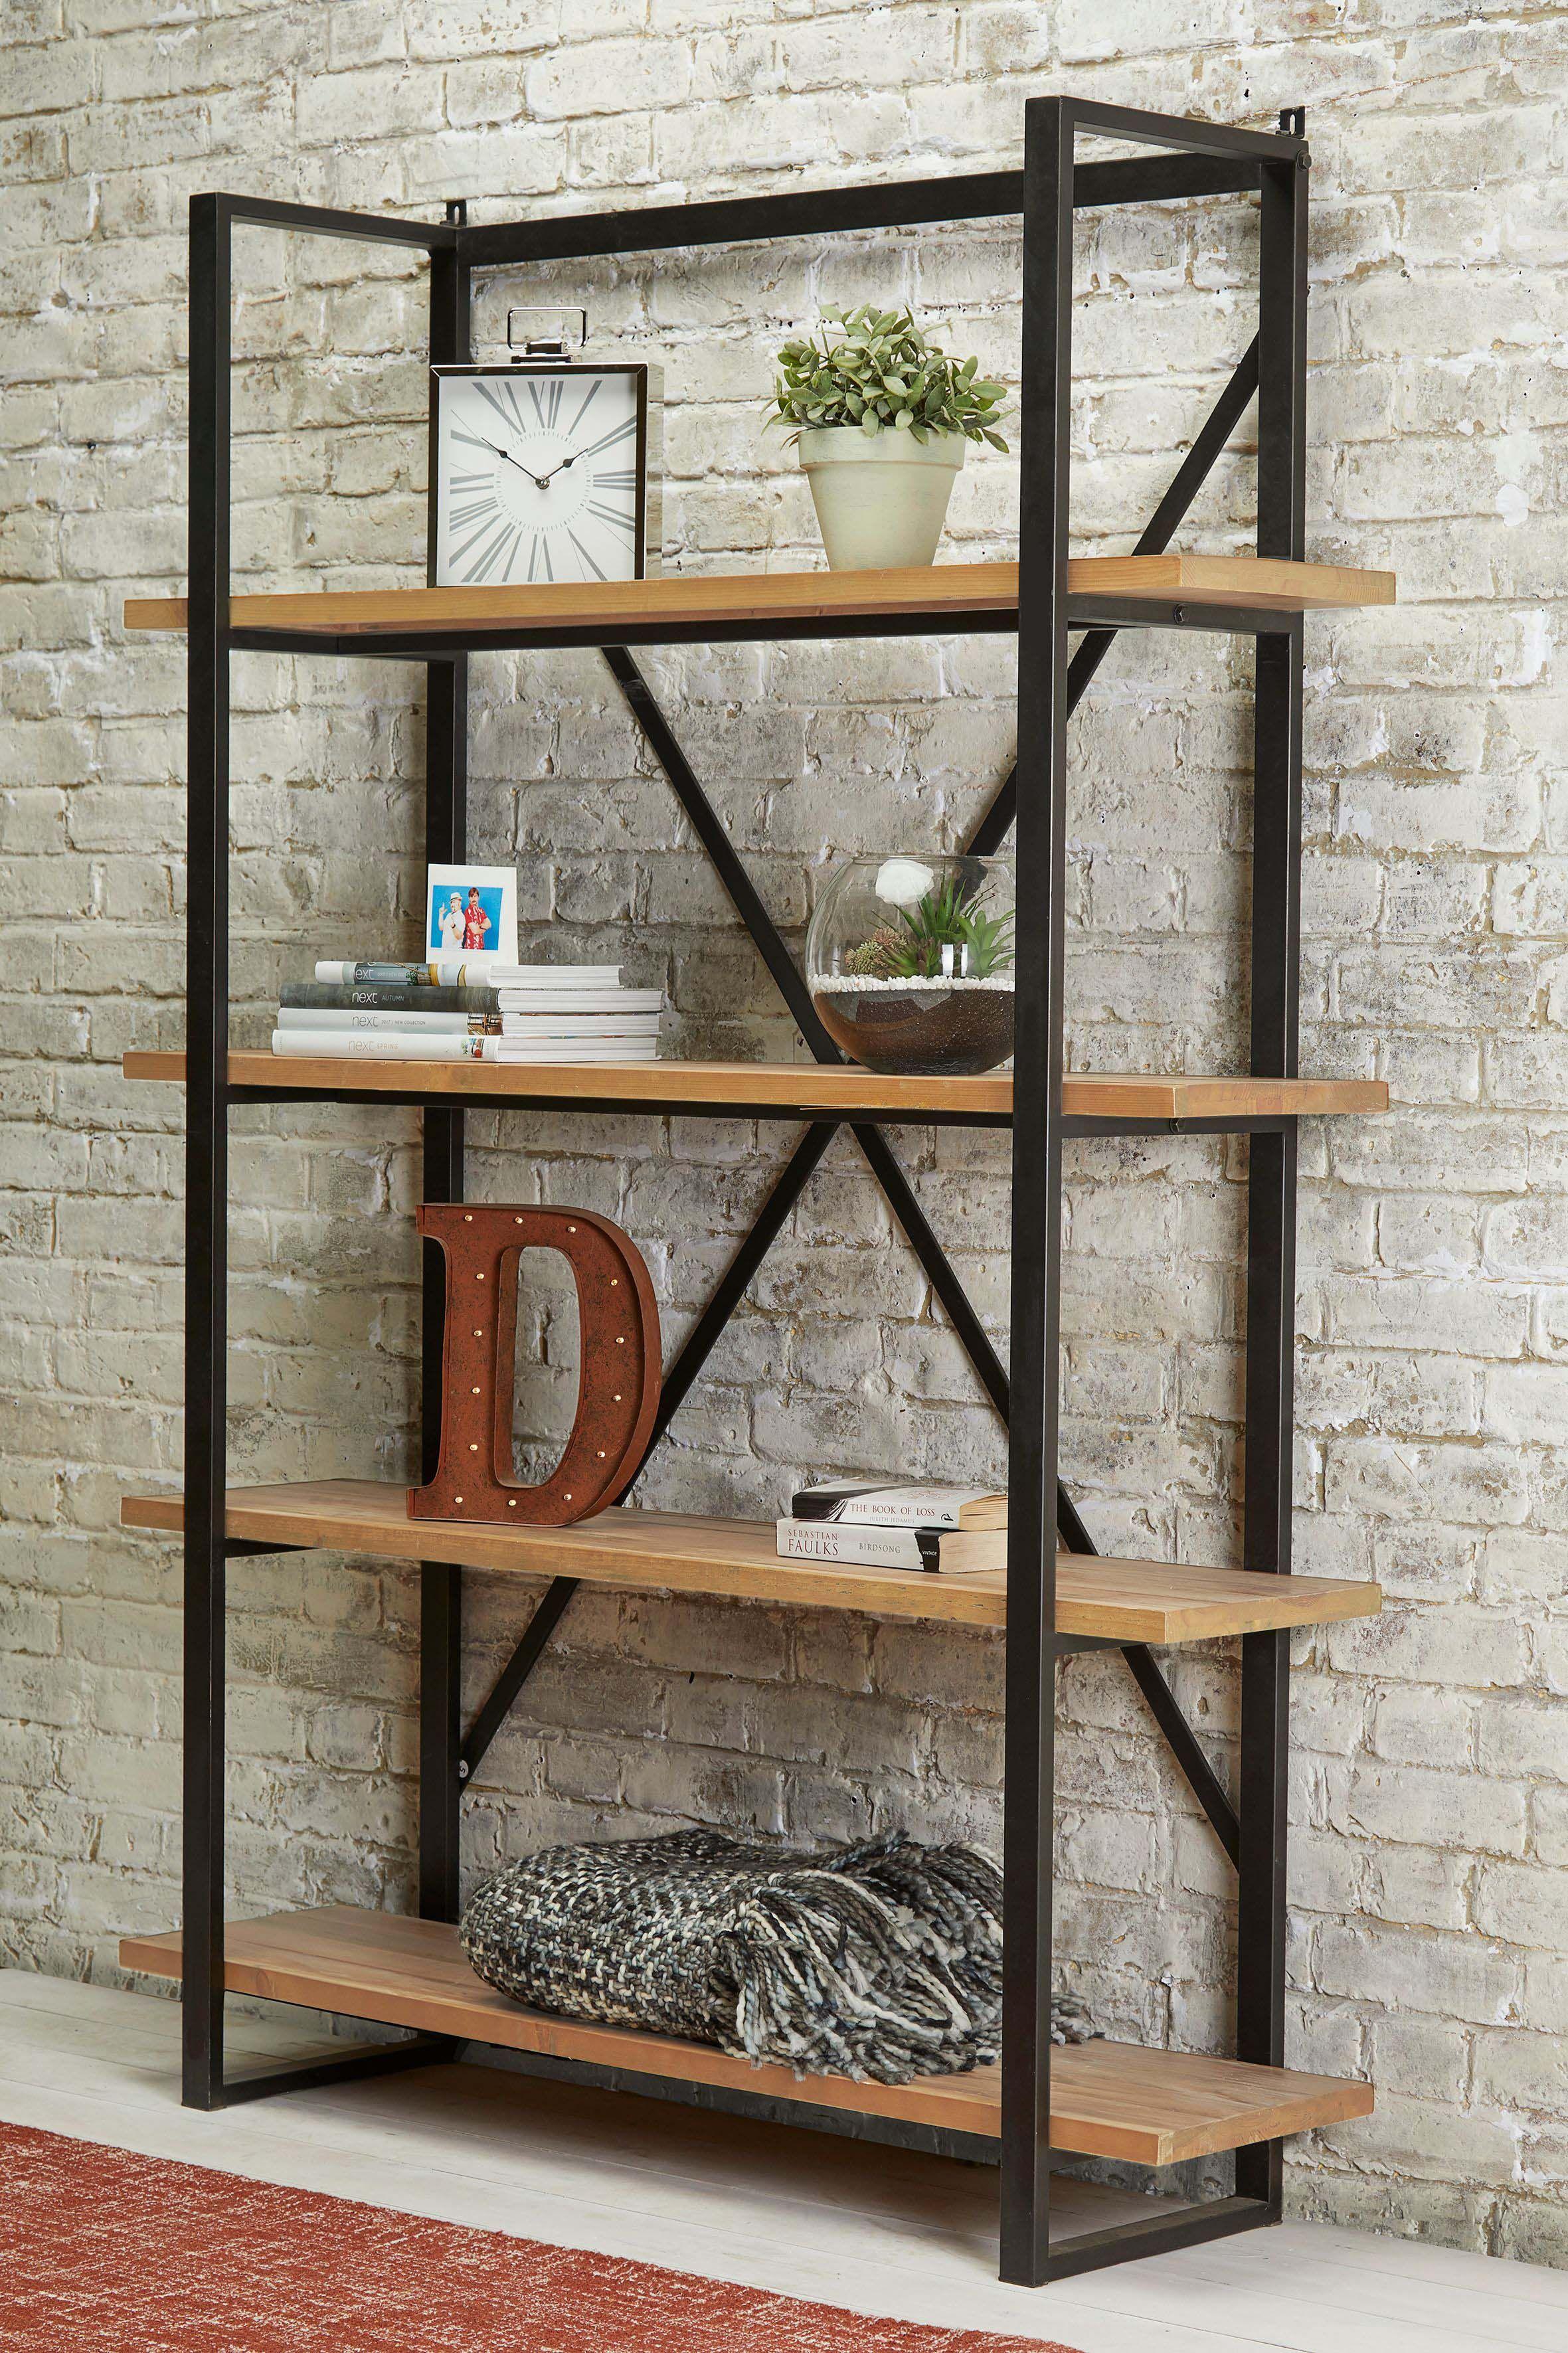 Next Hudson Tall Shelving Natural Shelf Decor Living Room Shelving Metal Furniture #tall #shelves #for #living #room